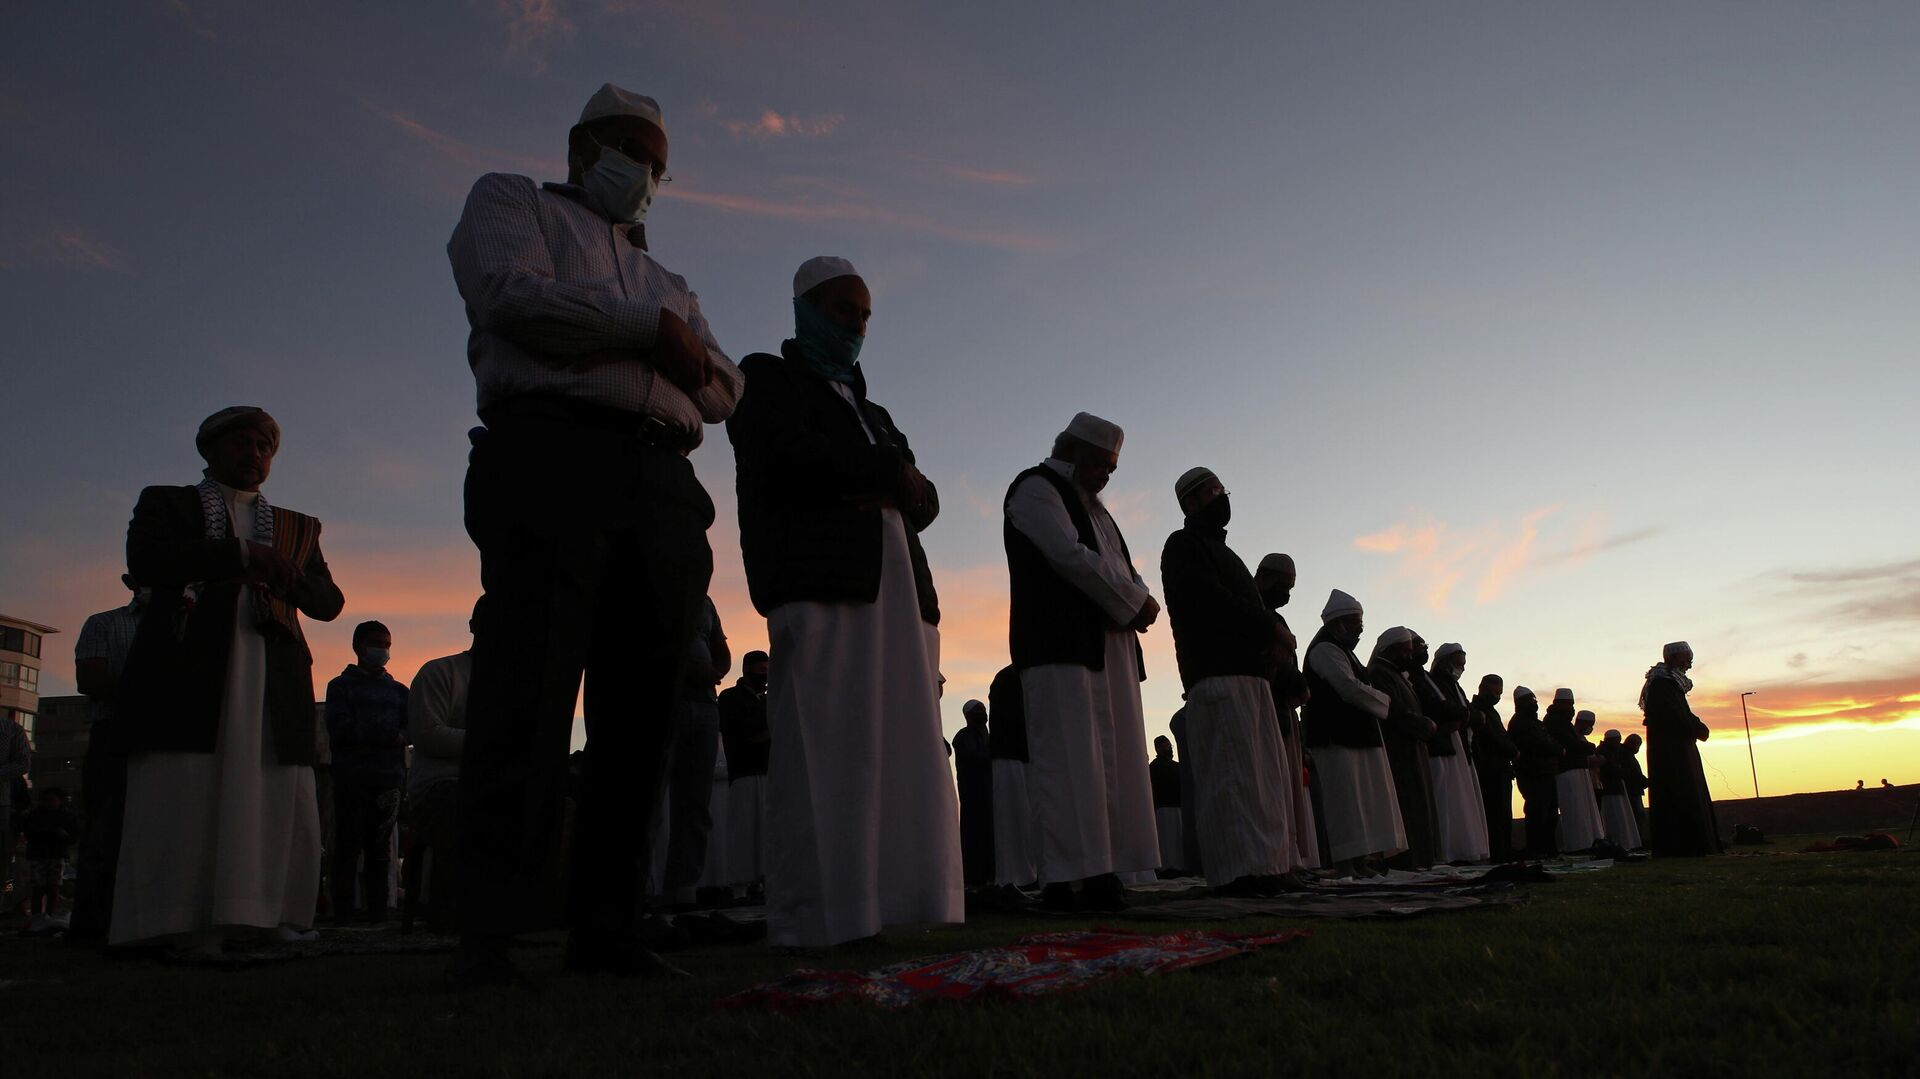 Мусульмане молятся на набережной Си-Пойнт в Кейптауне, Южная Африка. 12 апреля 2021 года - РИА Новости, 1920, 08.05.2021